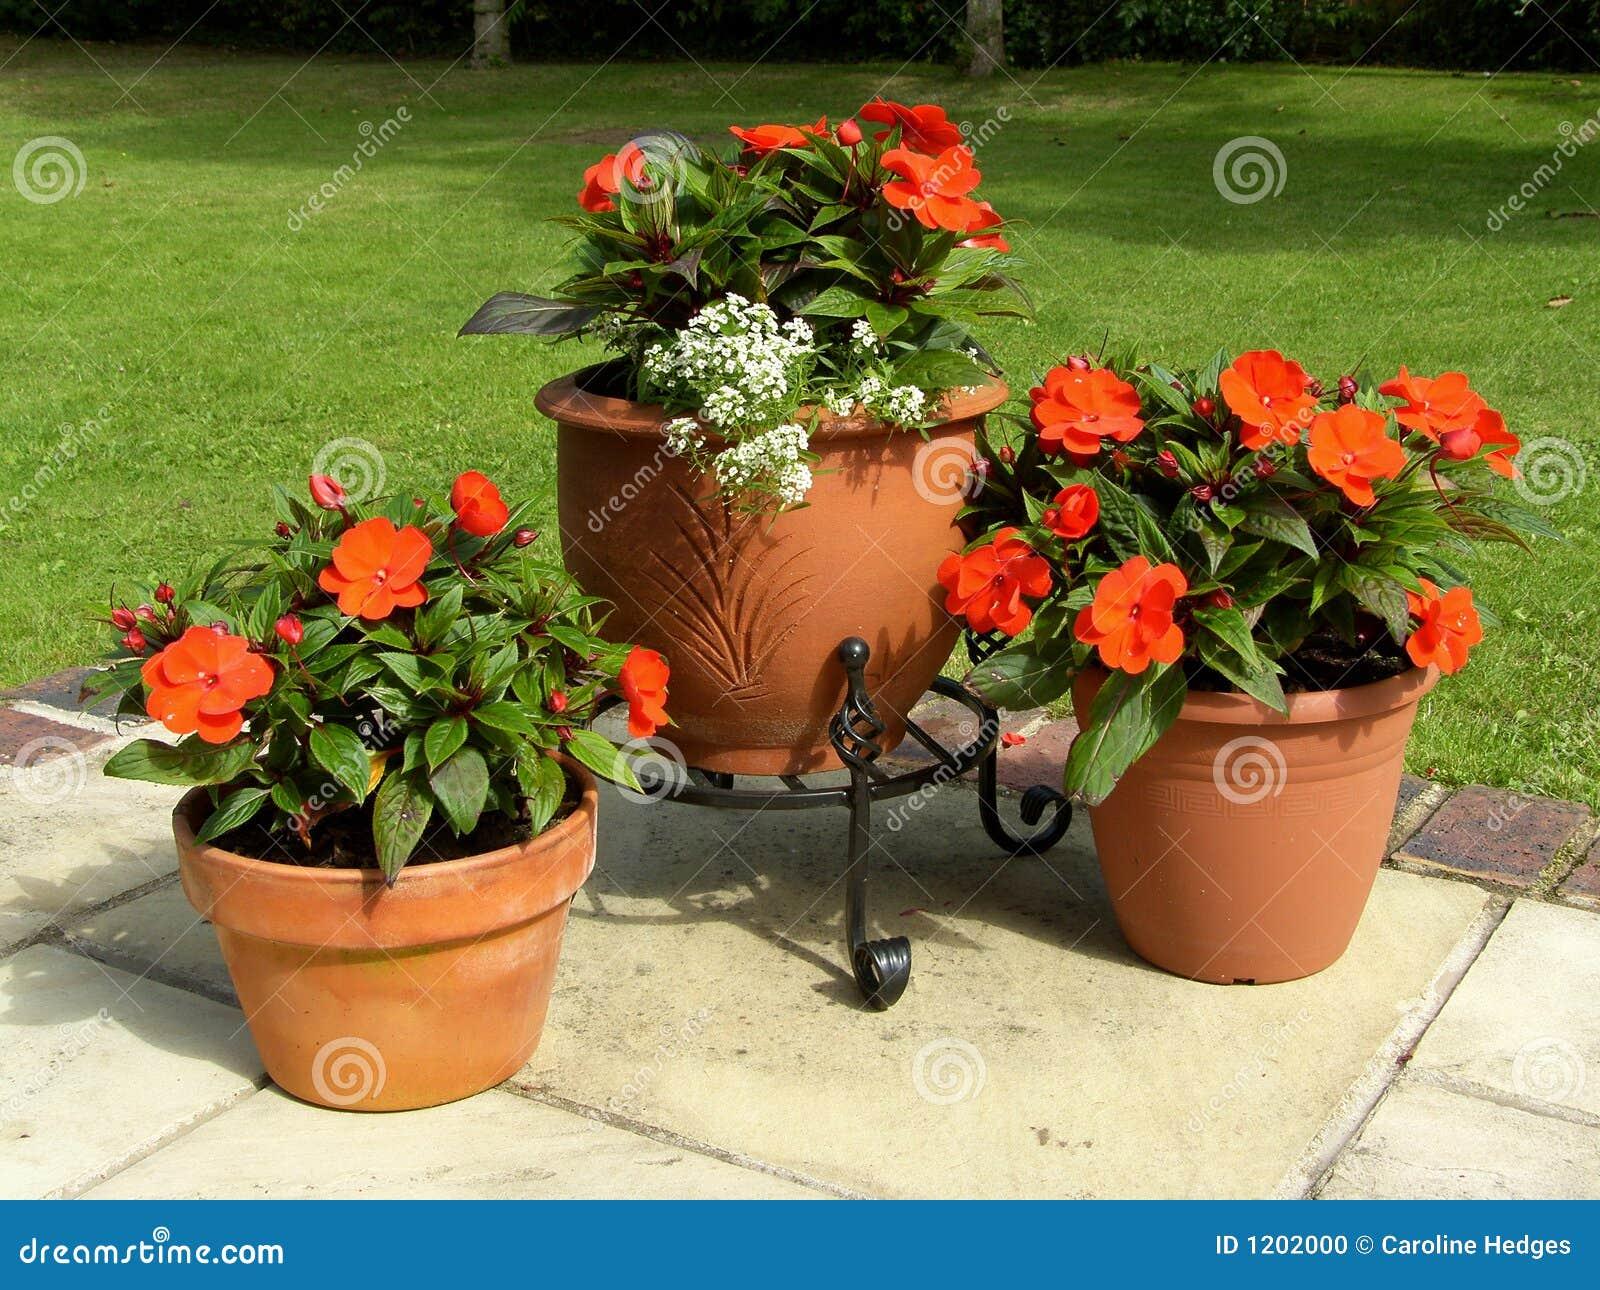 Awesome Patio Pots Stock Photo